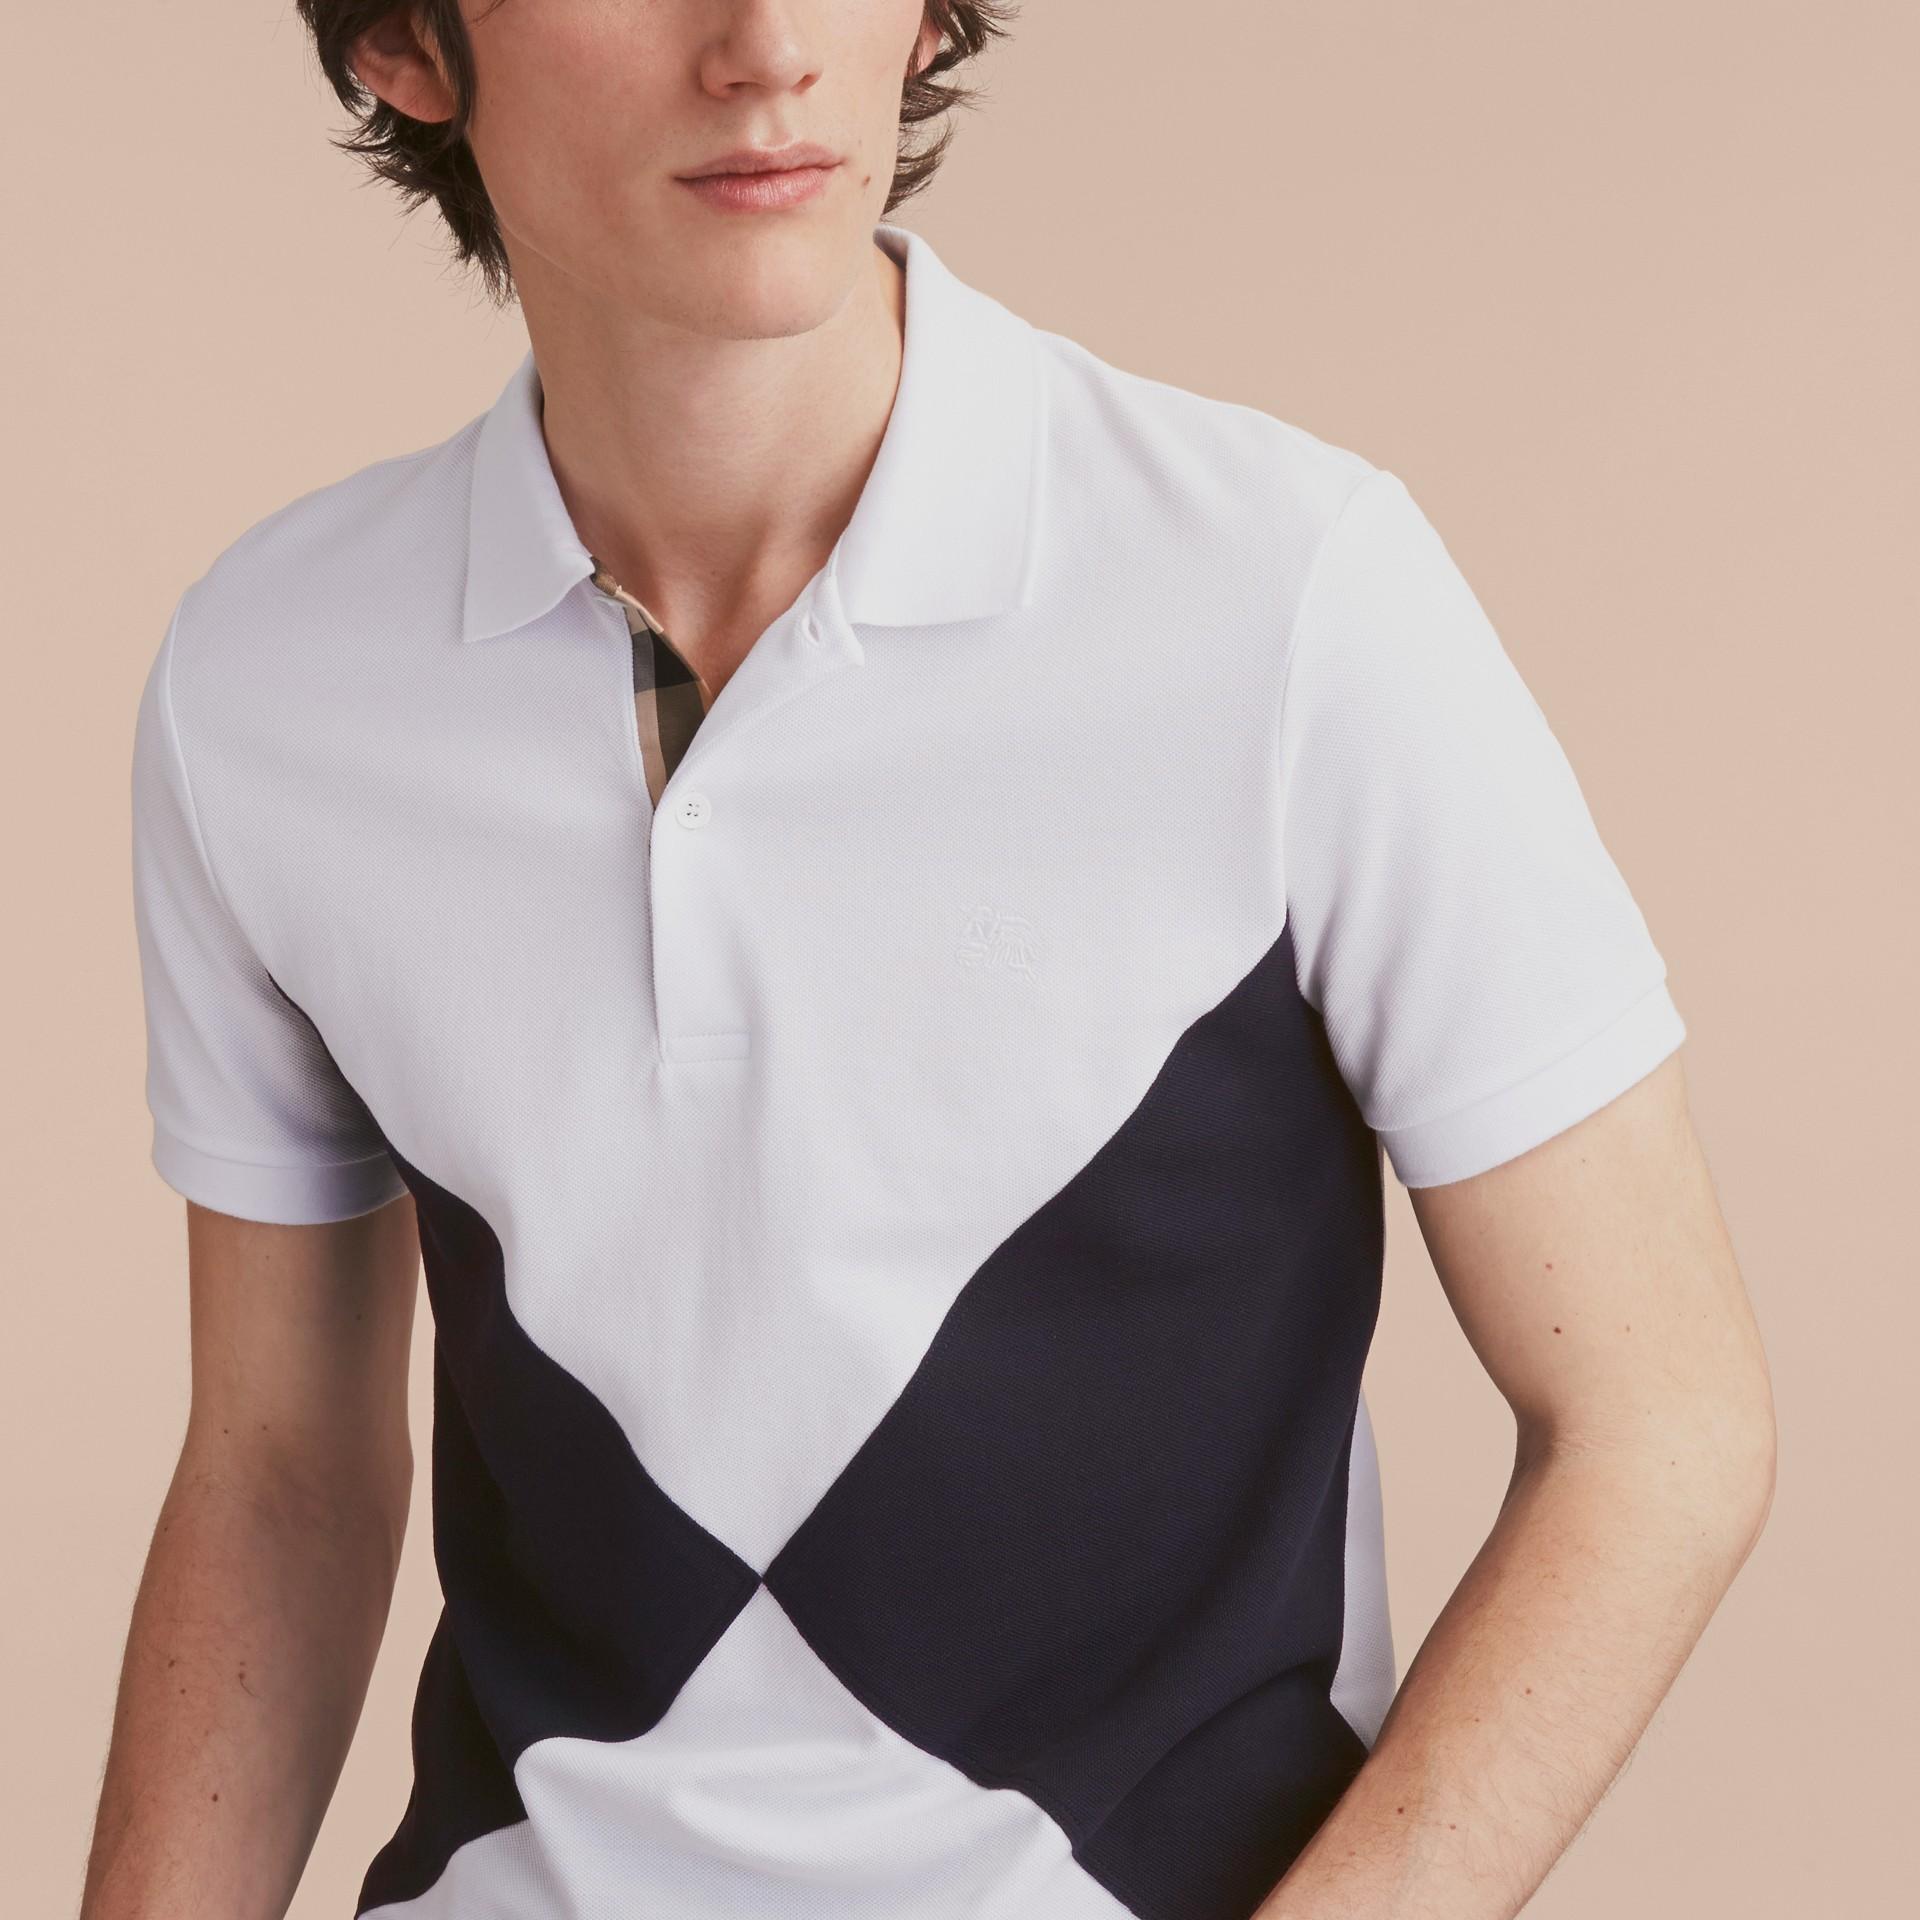 Geometric Motif Cotton Piqué Polo Shirt with Check Placket White - gallery image 5